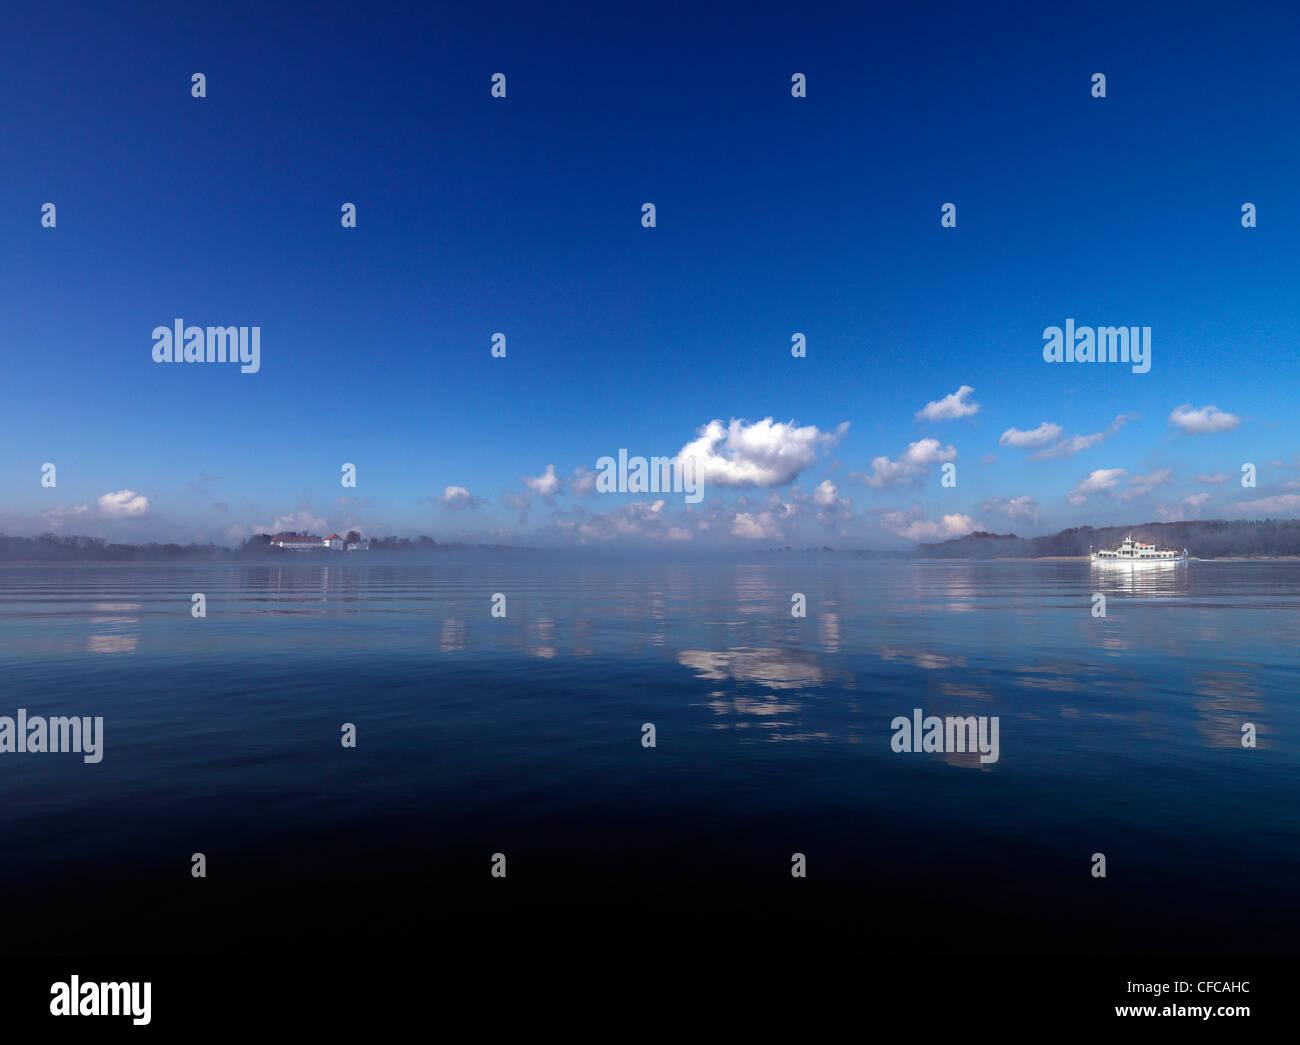 View across the reflecting lake towards Herreninsel, ferry boat, Lake Chiemsee, Chiemgau, Bavaria, Germany Stock Photo